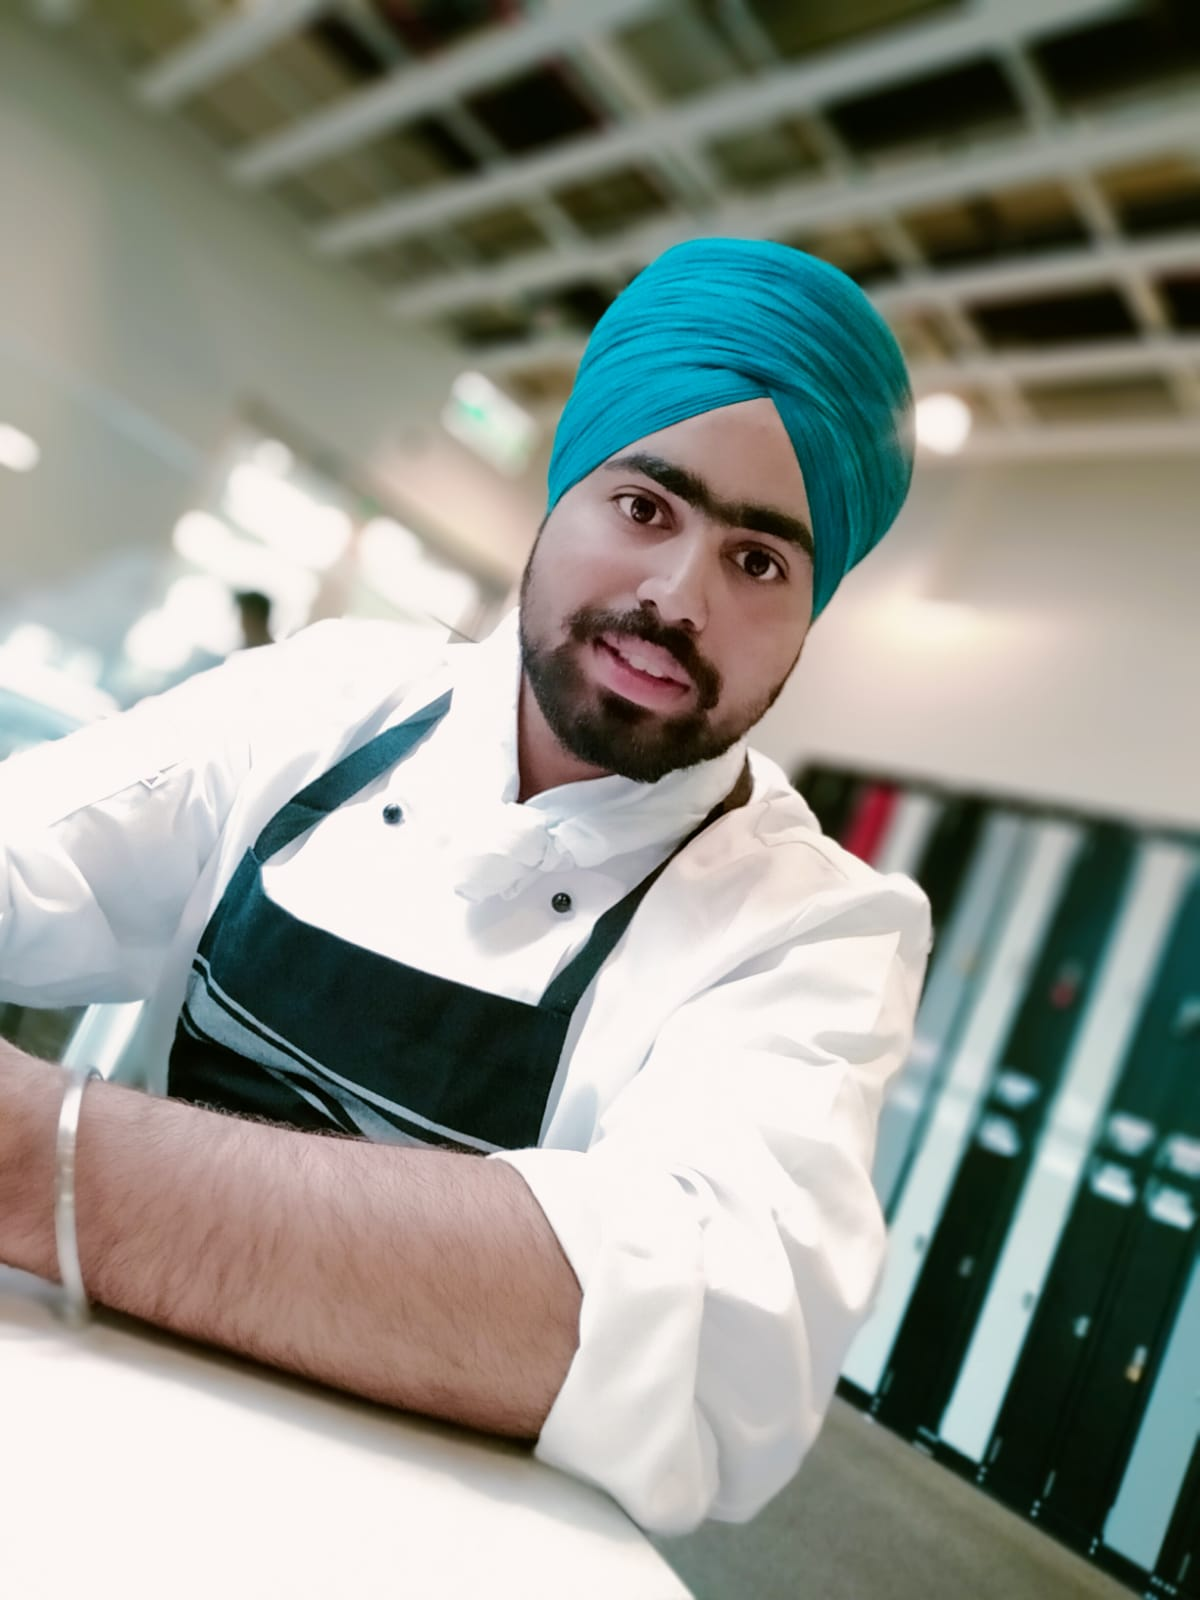 Palvir Singh